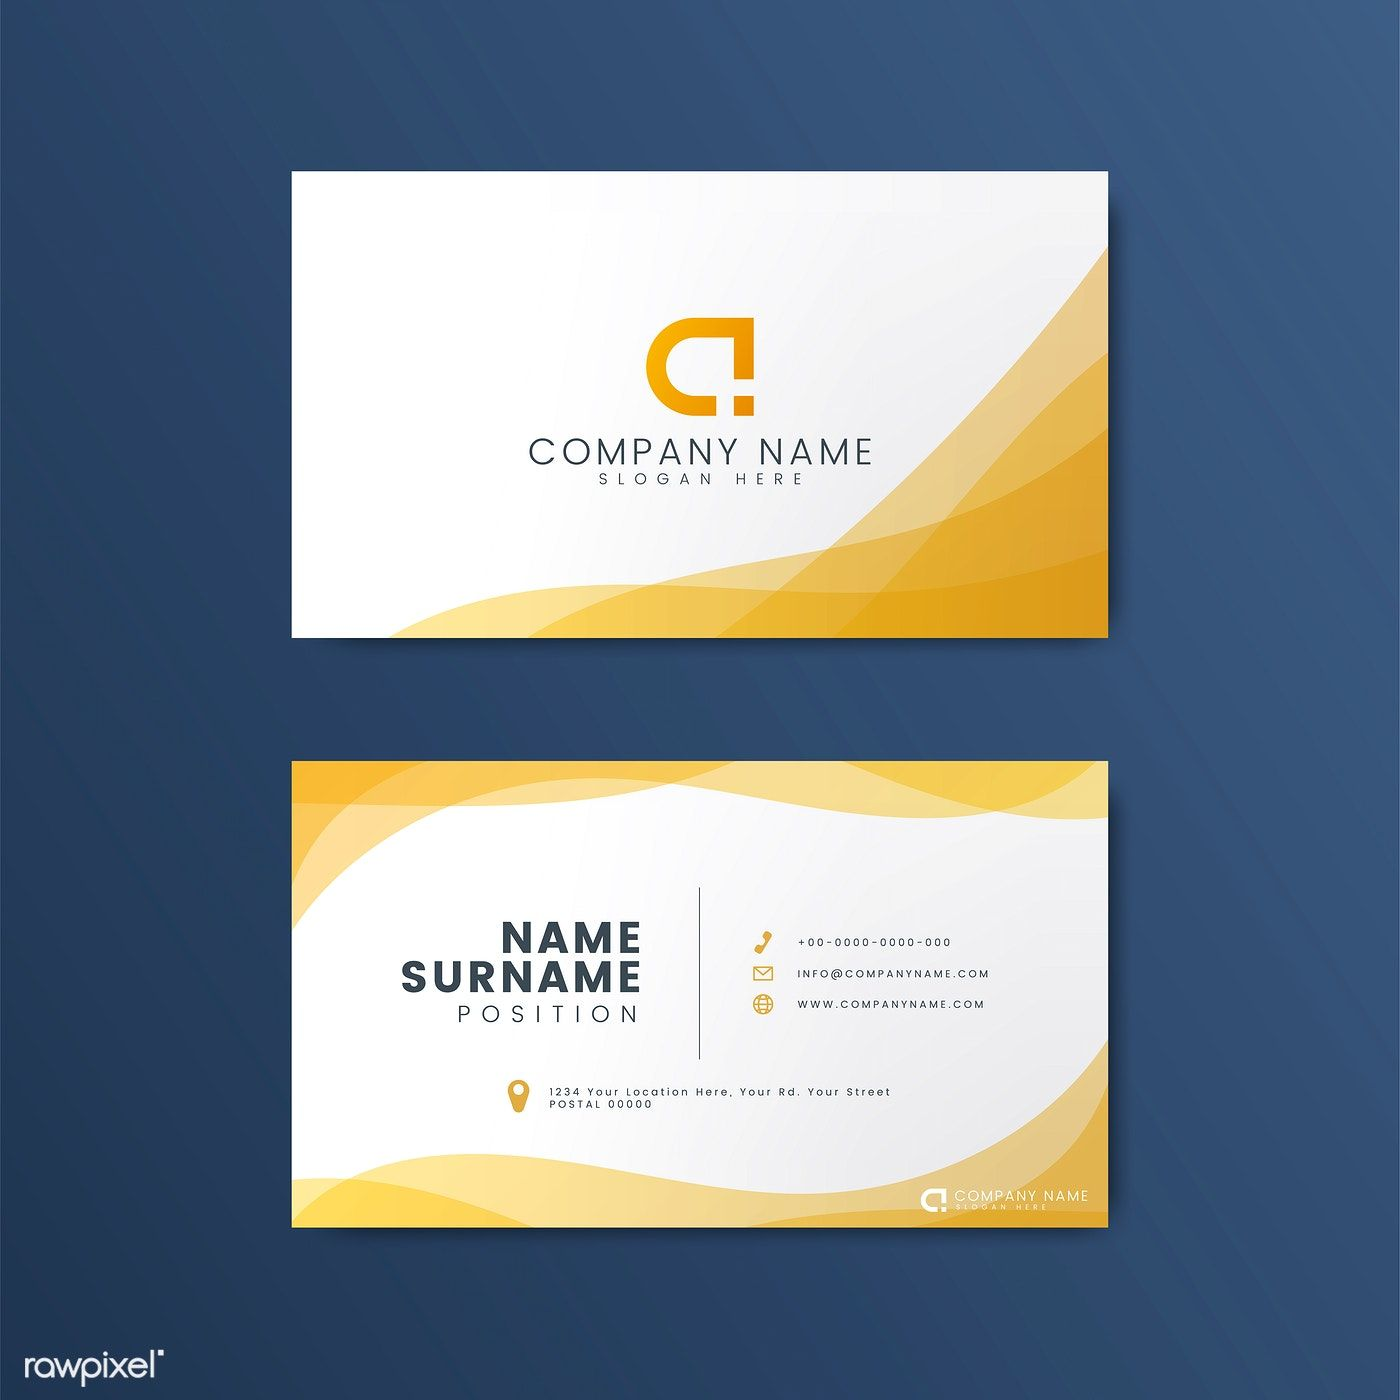 Modern Geometric Business Card Design Free Image By Rawpixel Com Free Business Card Design Business Card Design Business Card Design Minimal